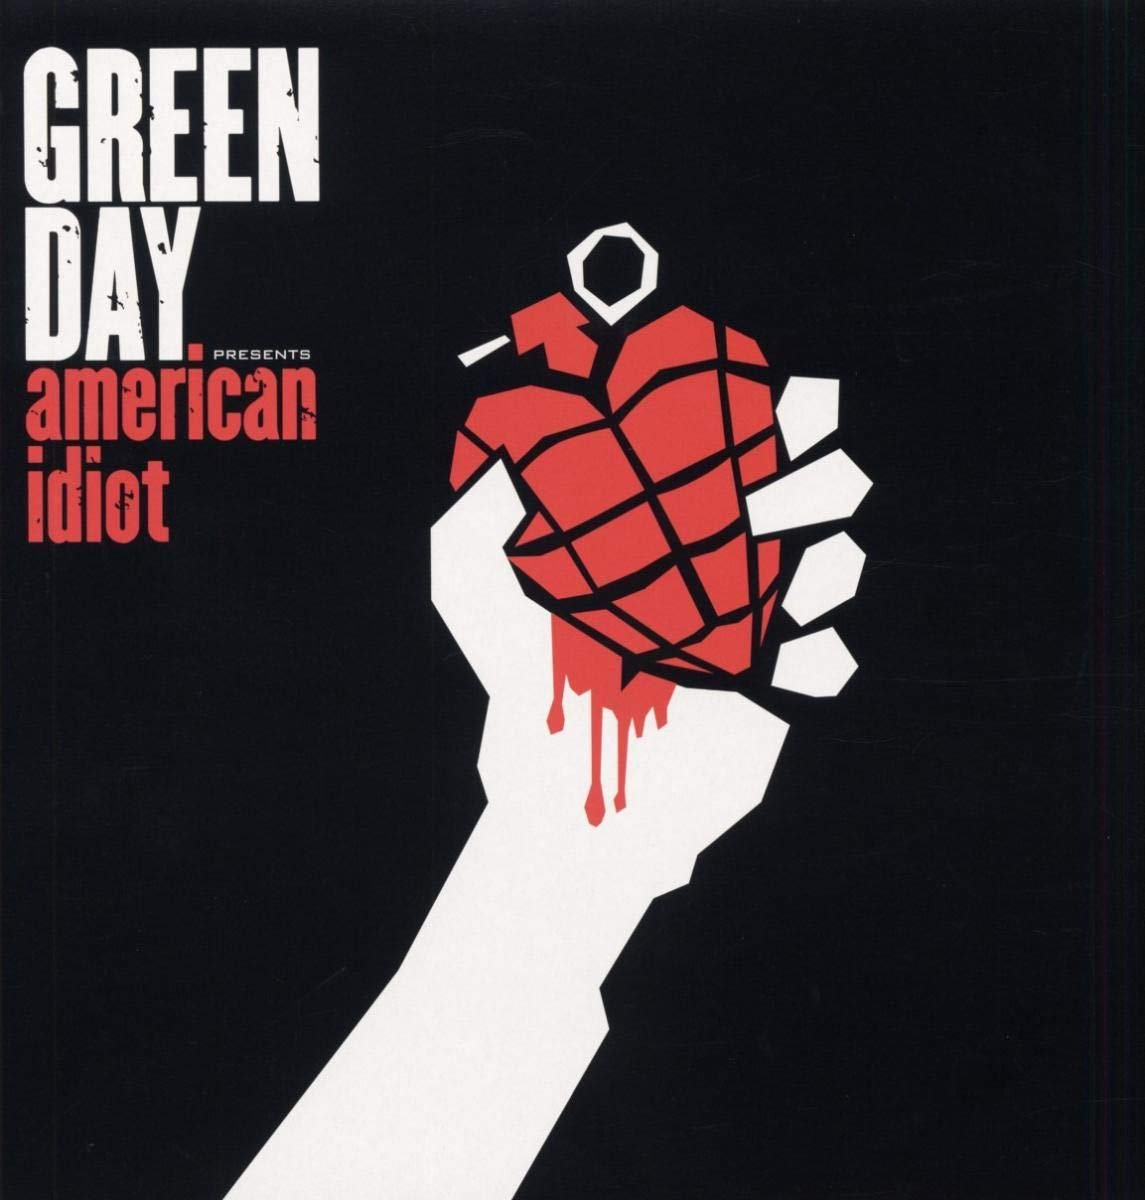 20 Albums, 20 Days: American Idiot